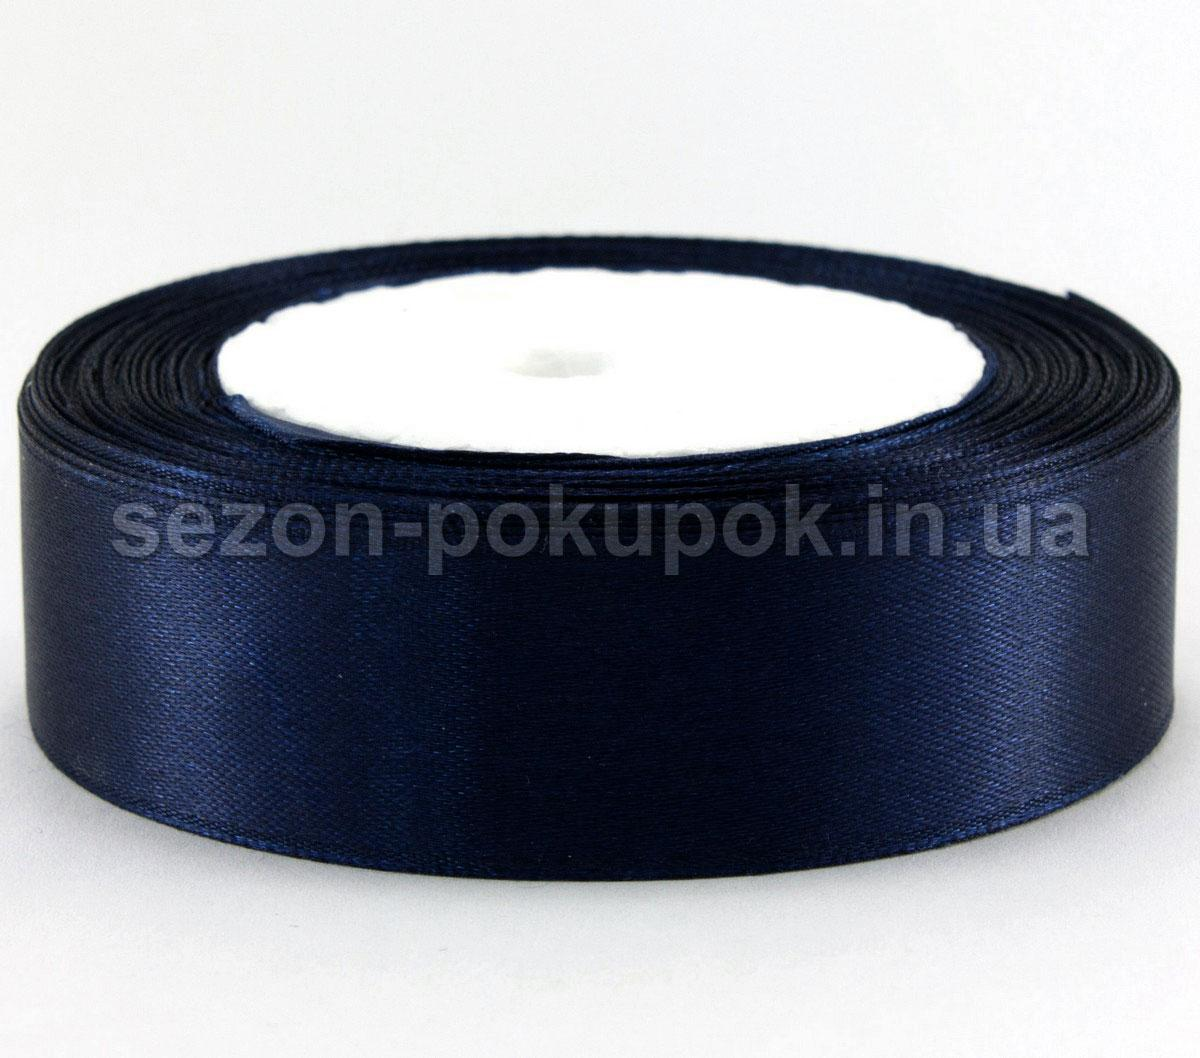 Лента атласная 23 метра 2.5 см. цвет - Тёмно синий